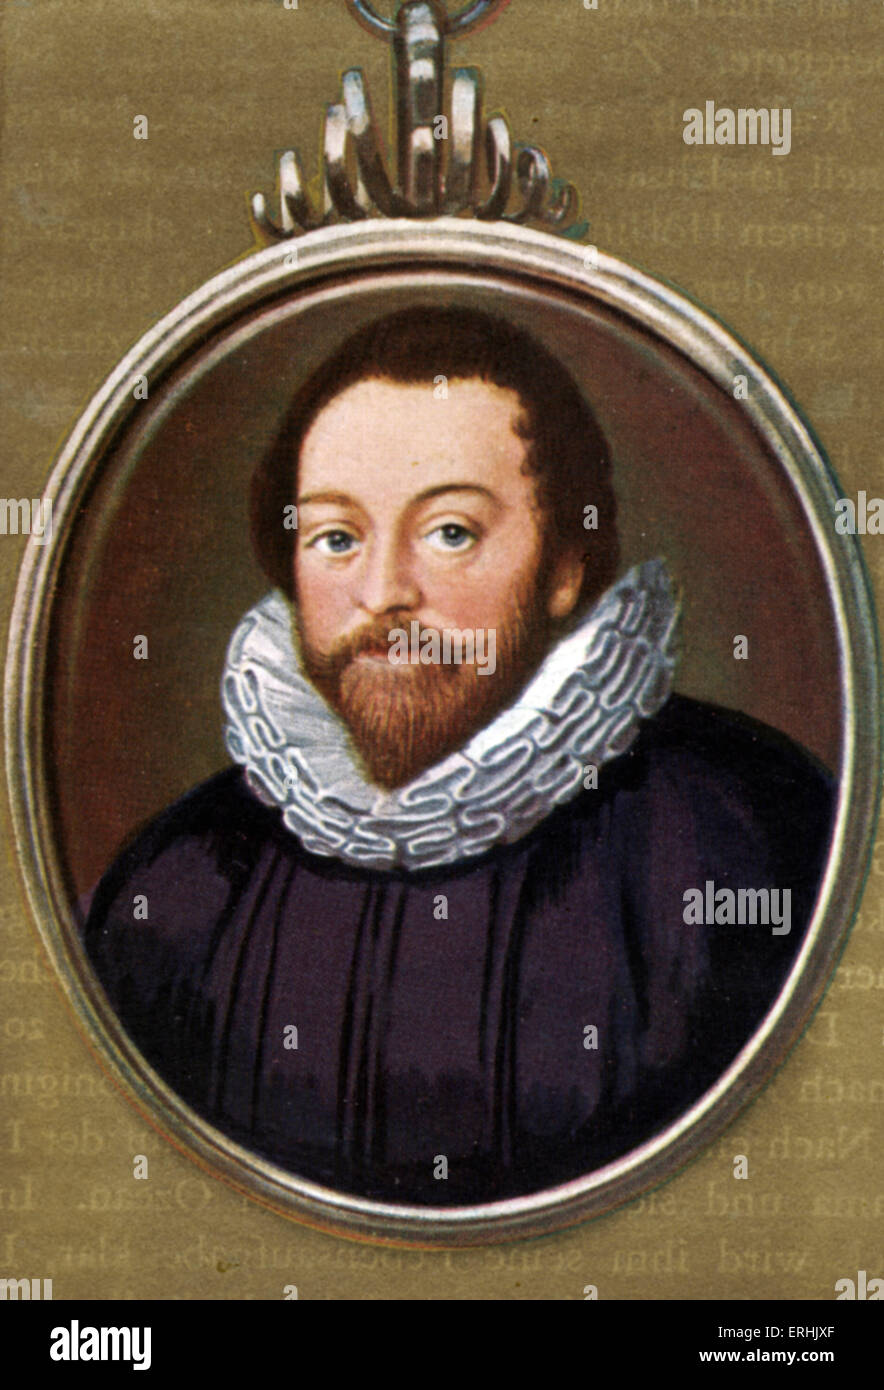 Sir Francis Drake. Portrait of the English navigator, sailor and politician. c. 1540 – January 28, 1596. - Stock Image